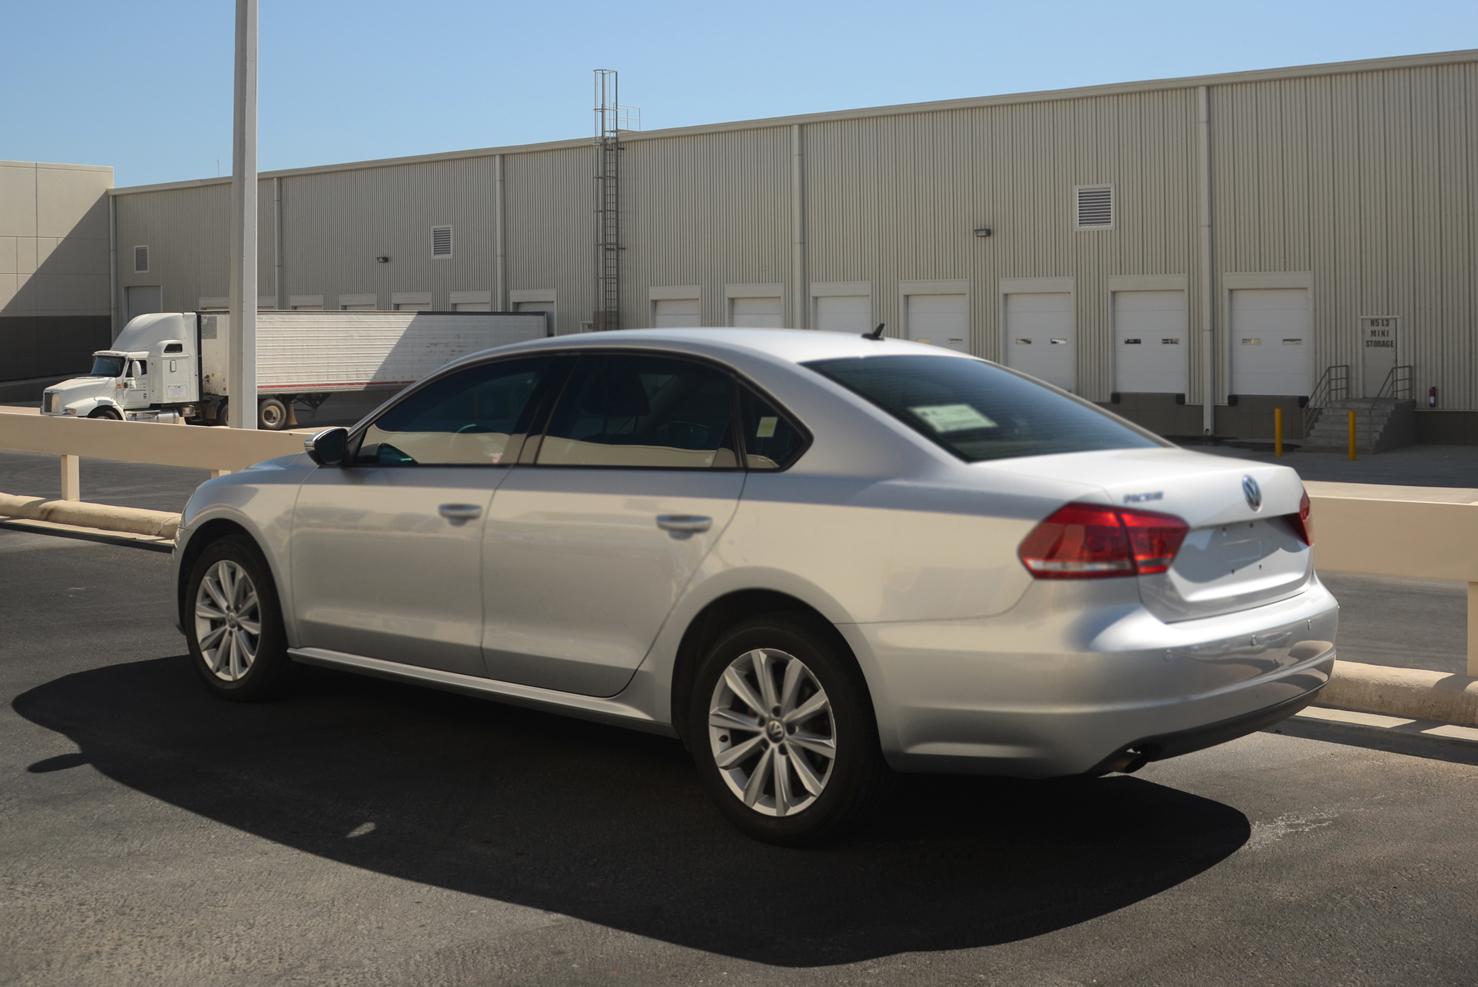 Volkswagen Passat (Sedanes Medianos de Lujo)